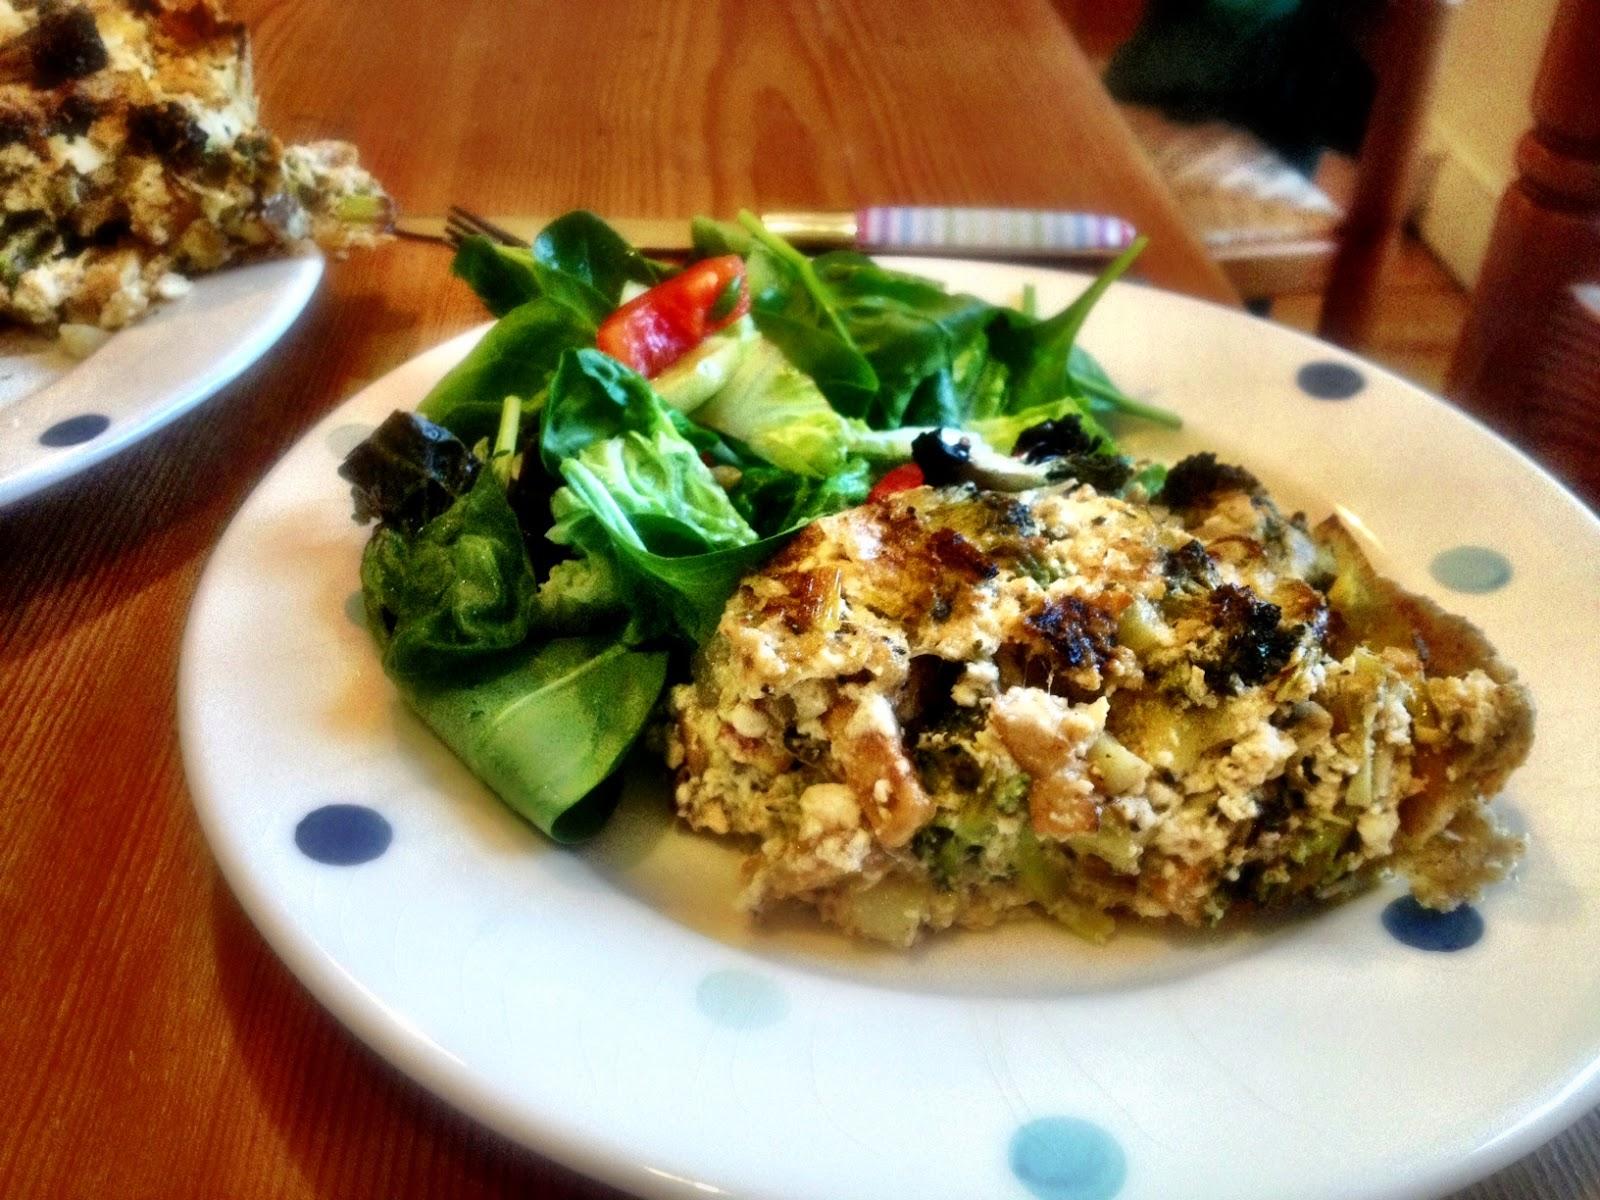 Savouring Sustainability: Vegan Quiche Lorraine (with broccoli)